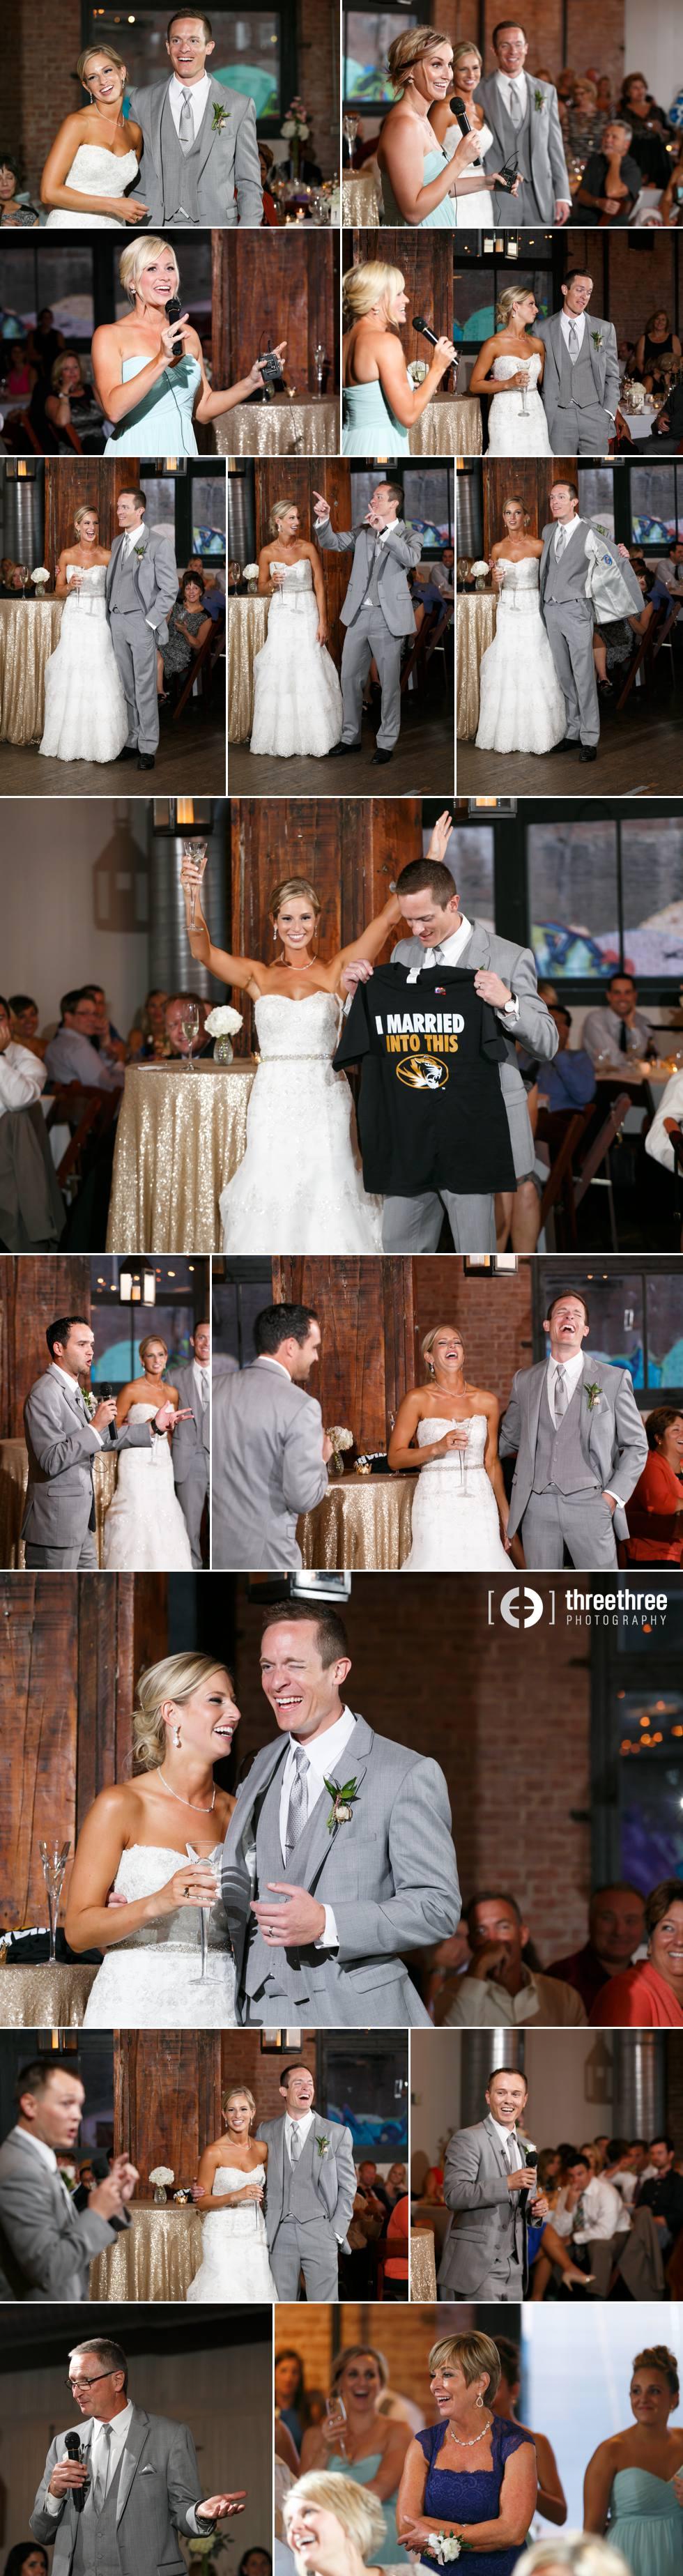 Natalie_AJ_wedding 15